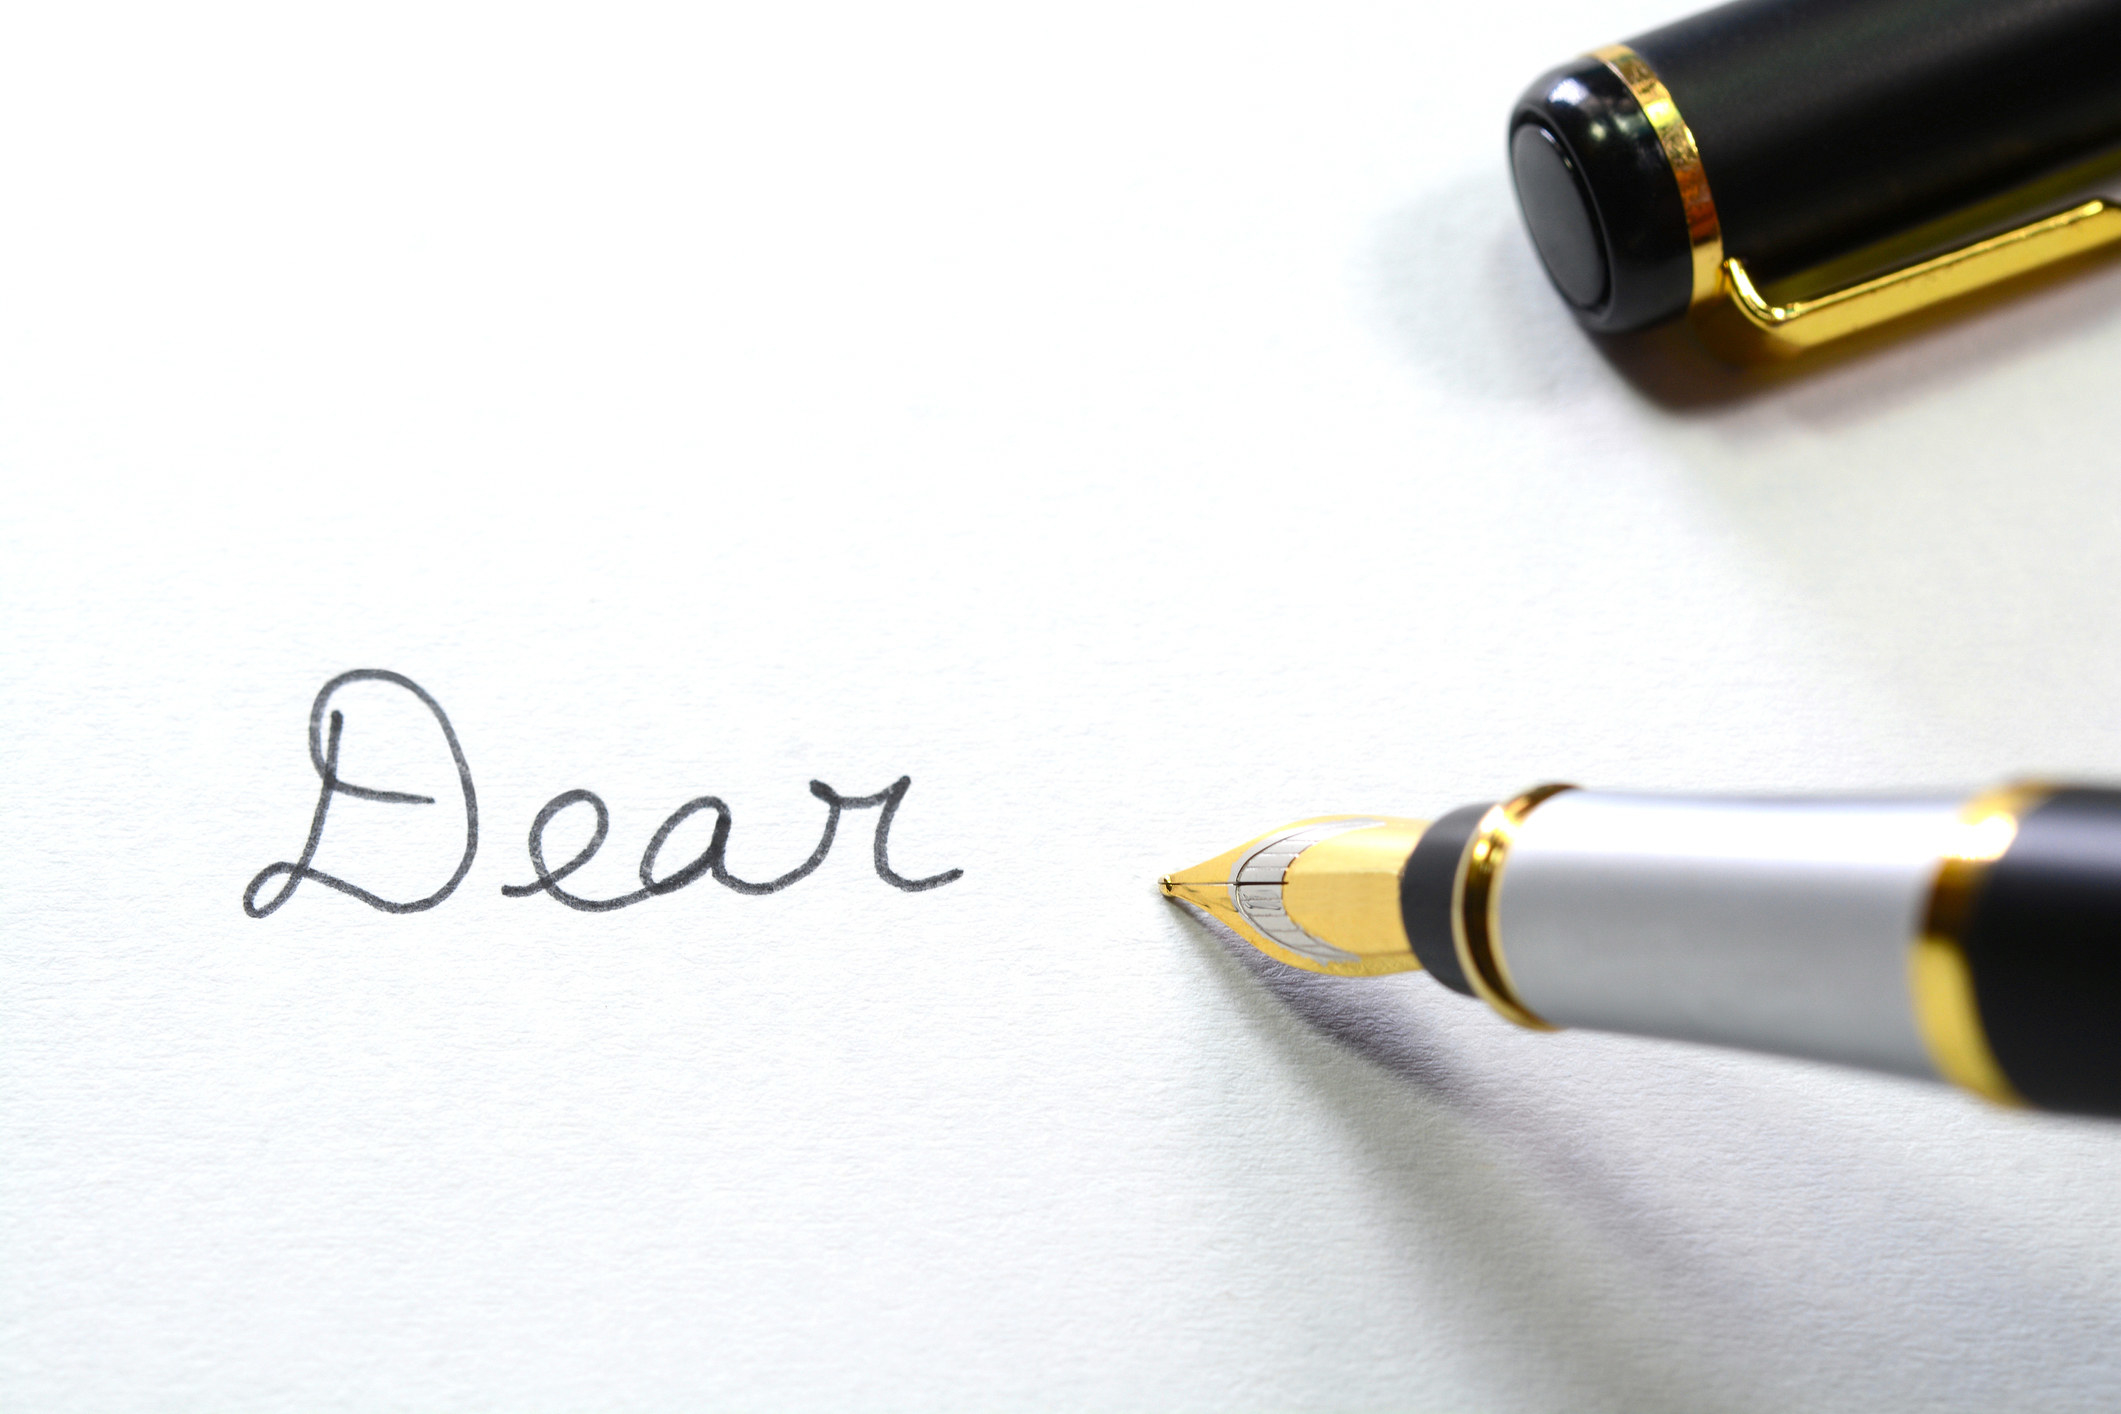 """Dear,"" written with a fountain pen in cursive"